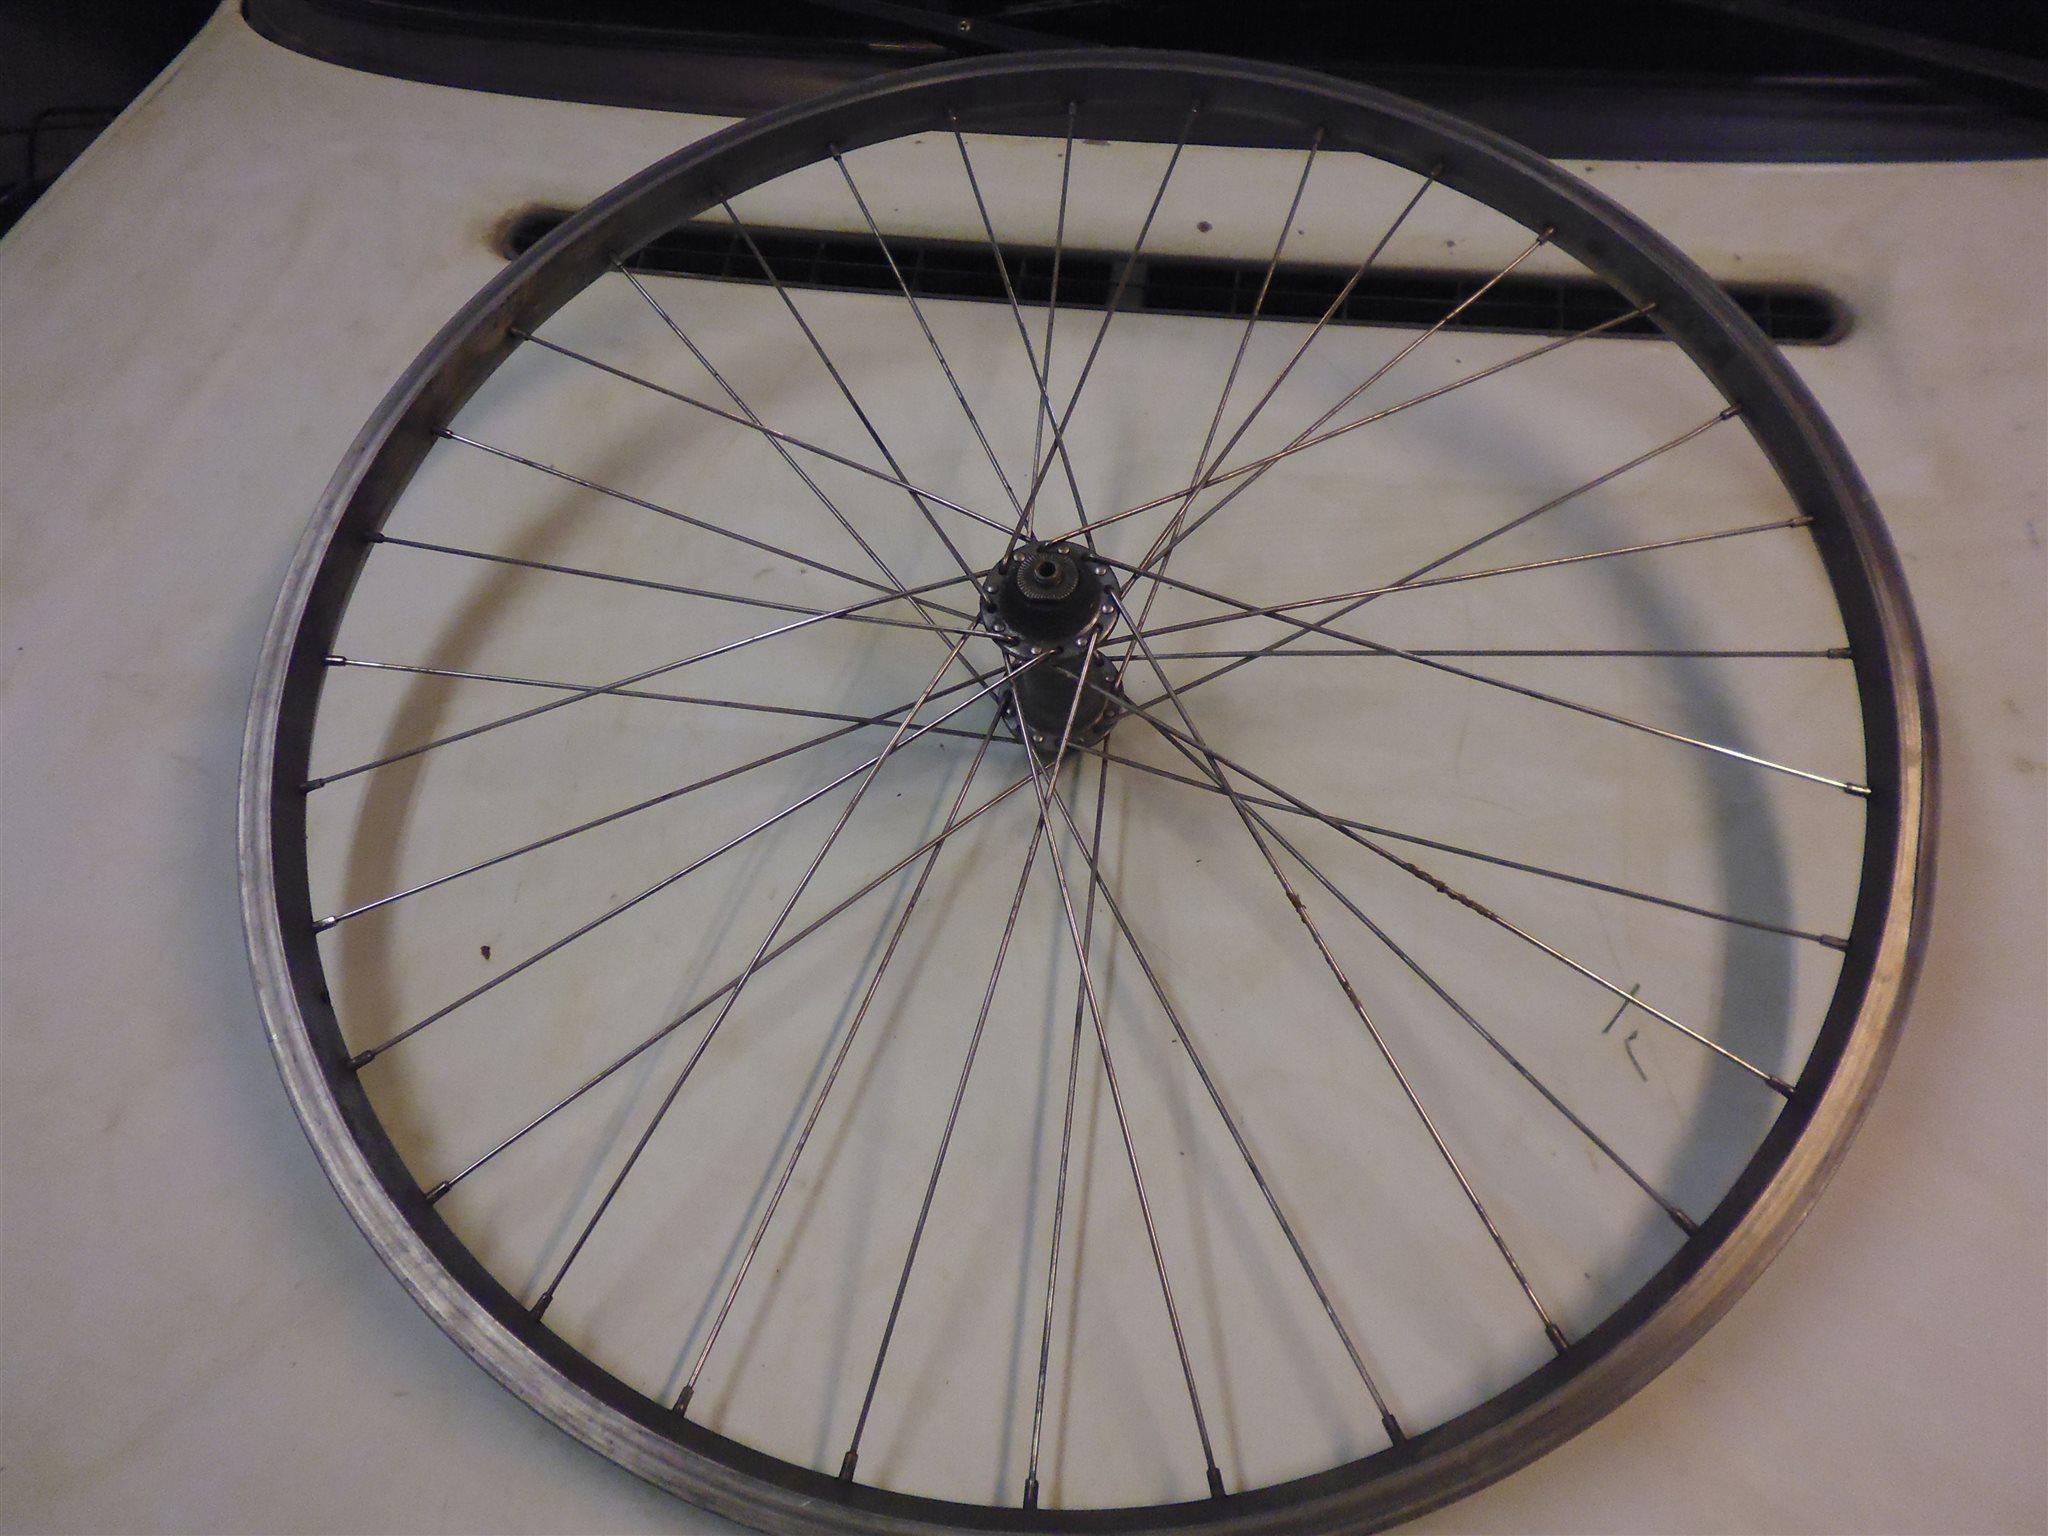 cykelhjul 26 tum